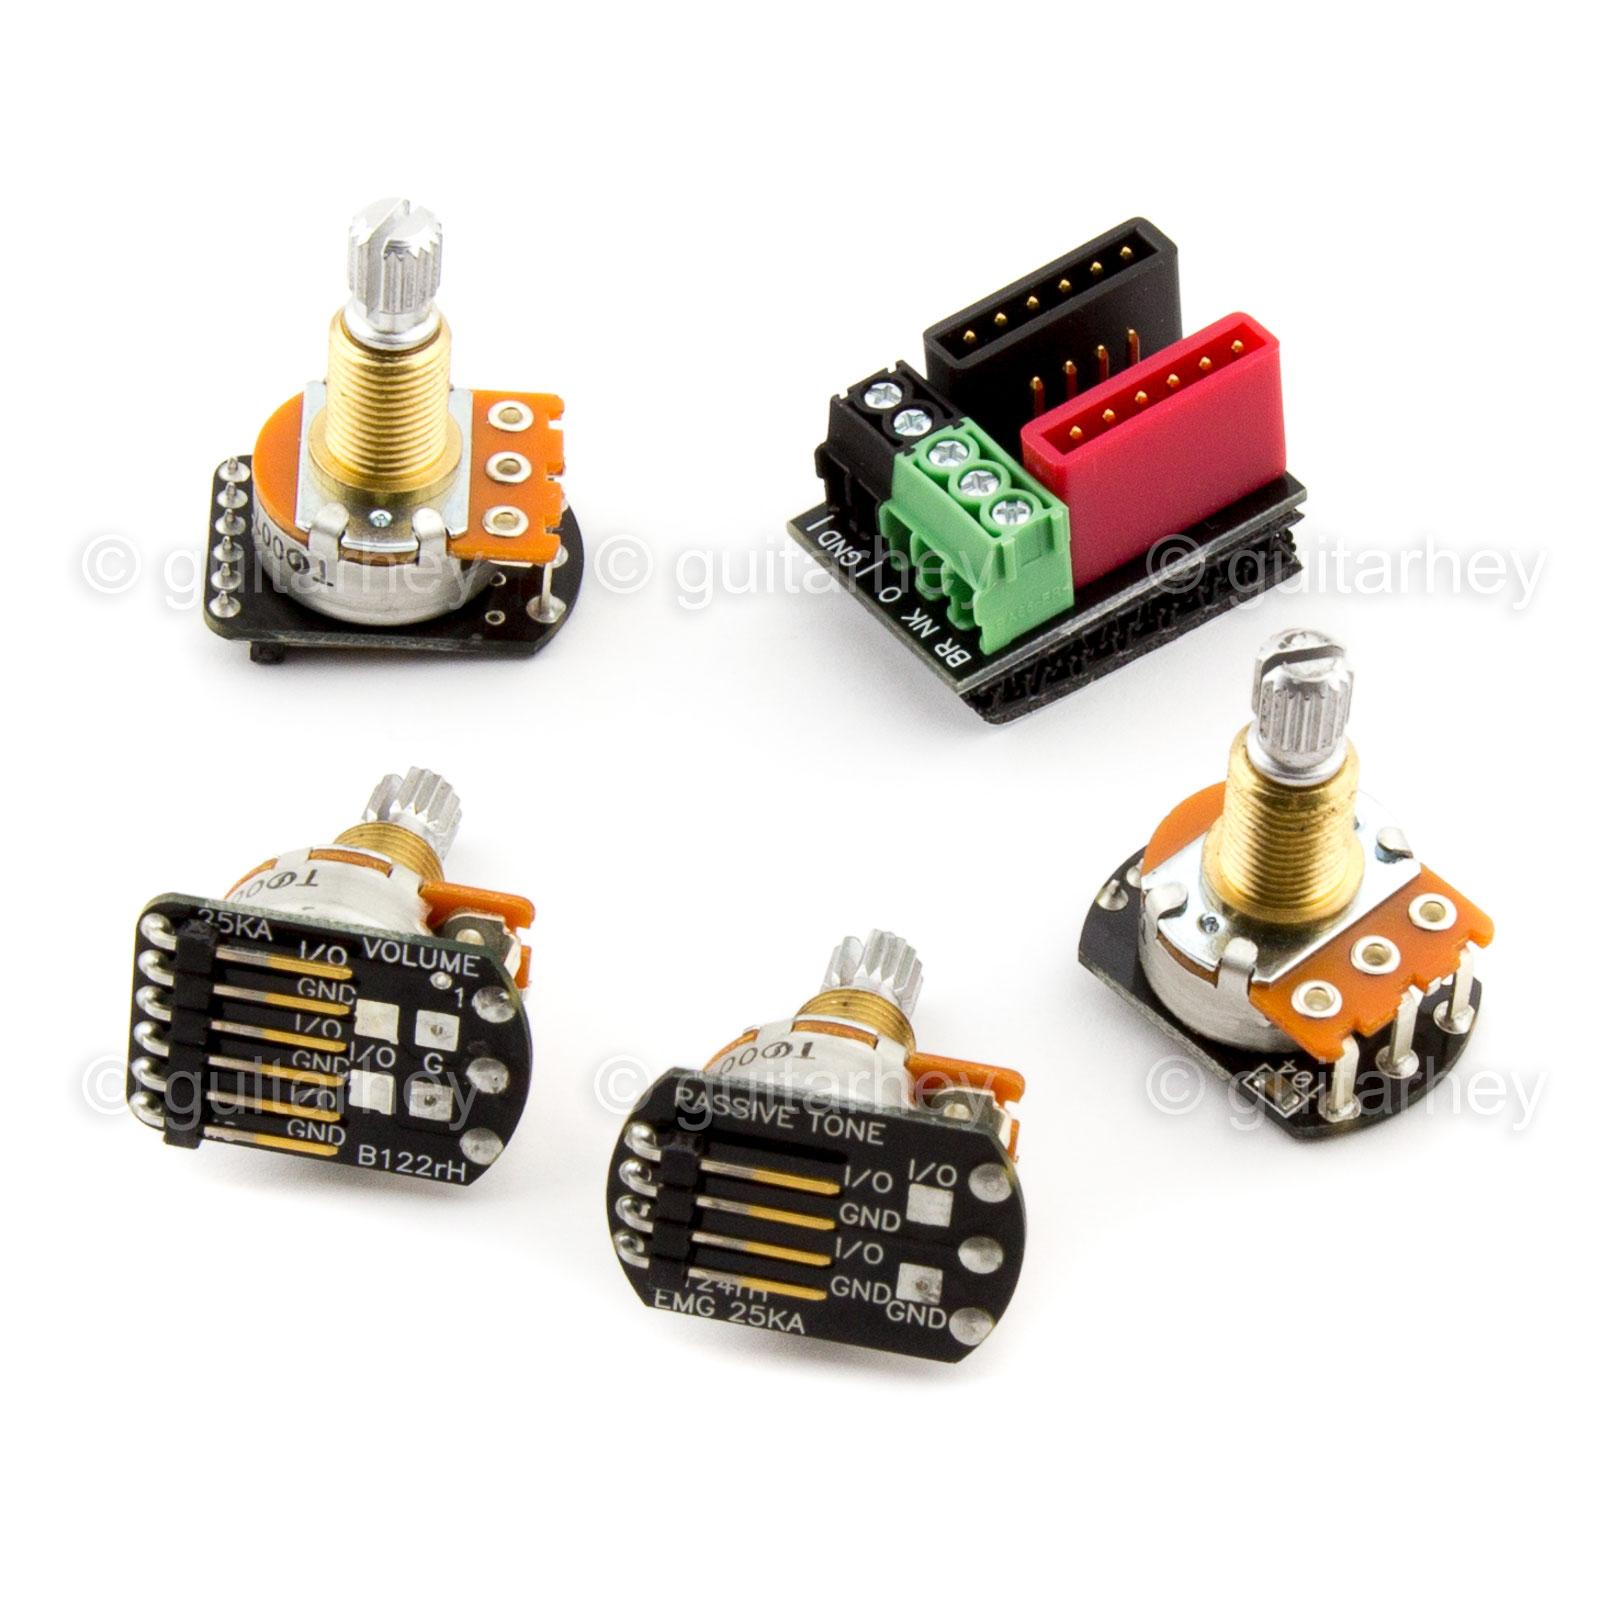 hight resolution of new emg solderless wiring kit 1 or 2 active pickups pot short shaftdetails about new emg